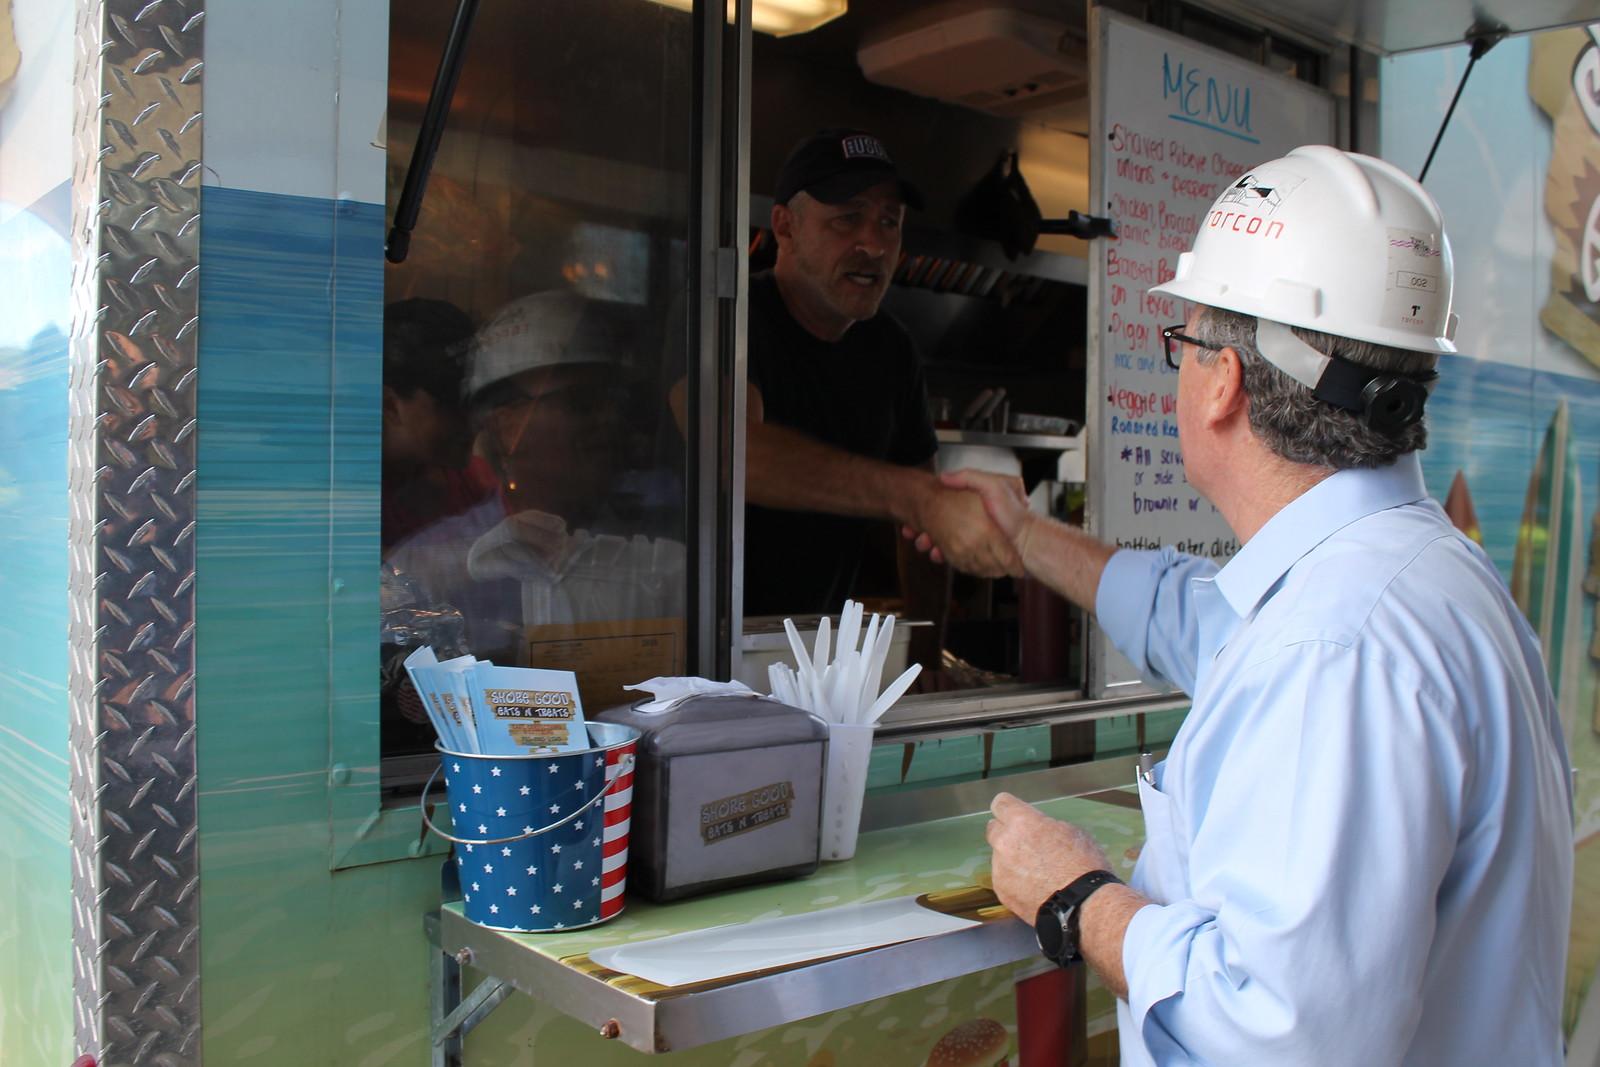 Jon Stewart Surprises Basie Center Construction Workers with Lunch 9.26.18